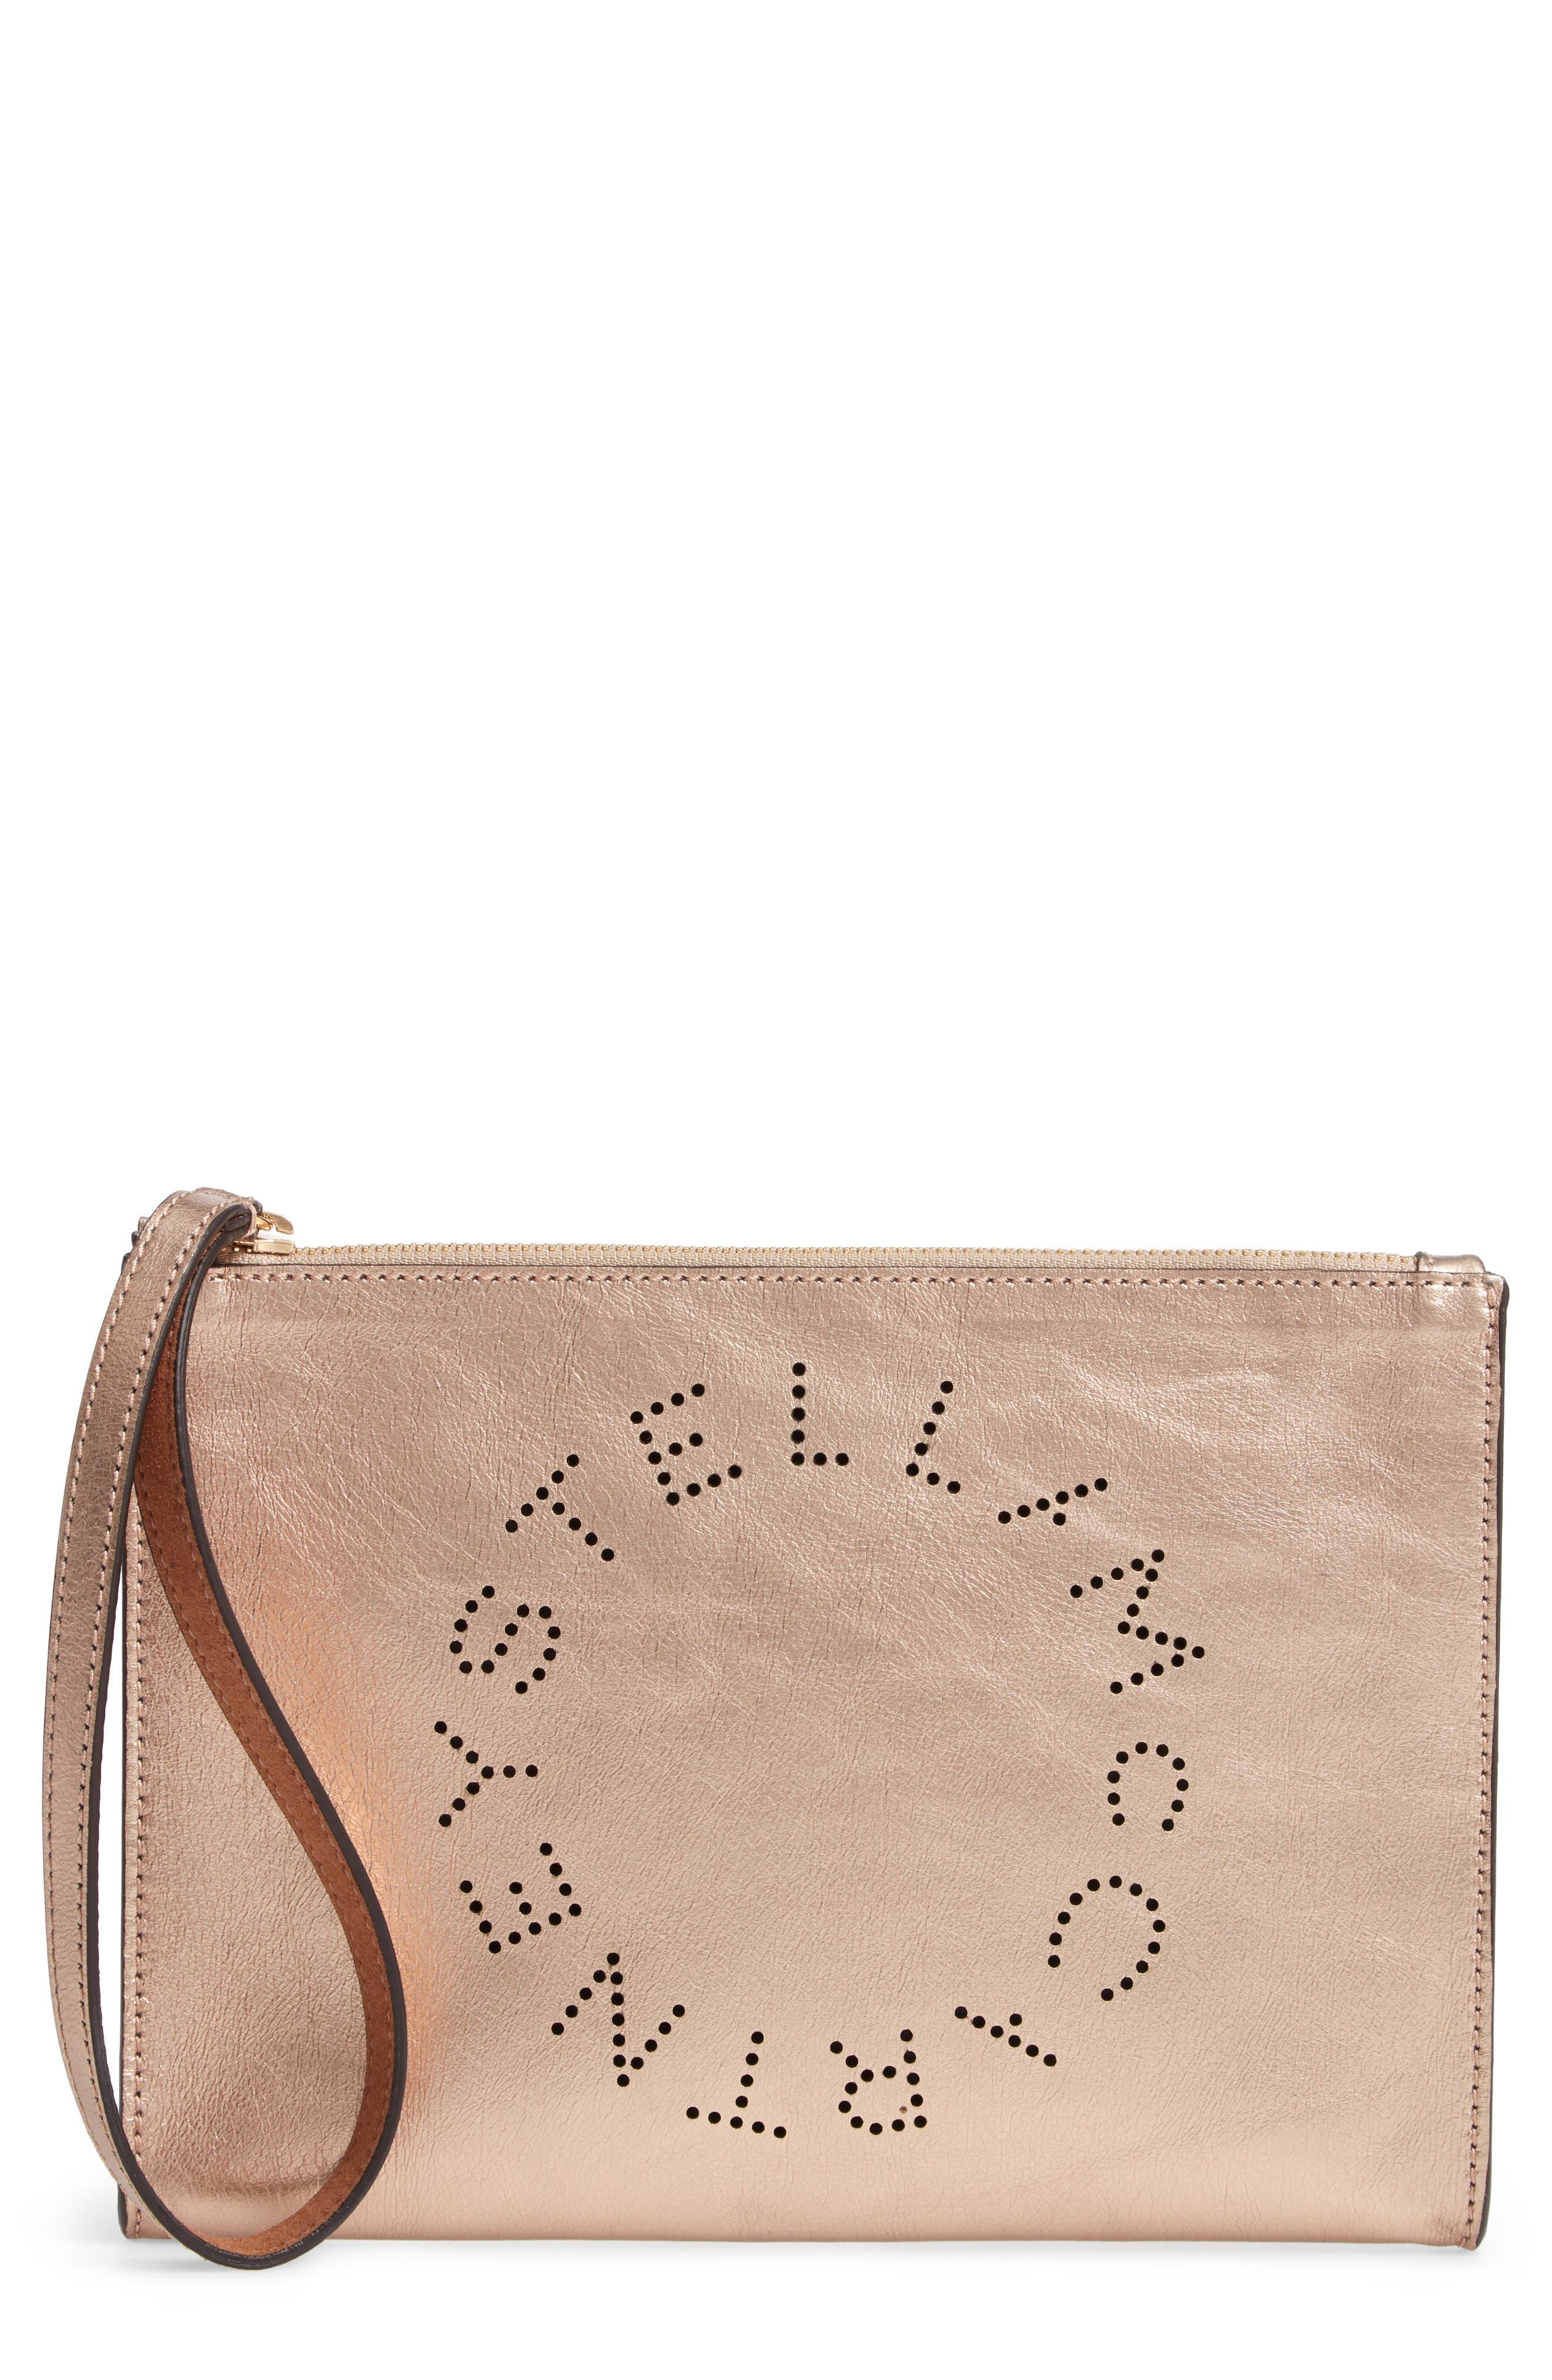 STELLA MCCARTNEY, Metallic Faux Nappa Leather Wristlet Clutch, Main thumbnail 1, color, 715